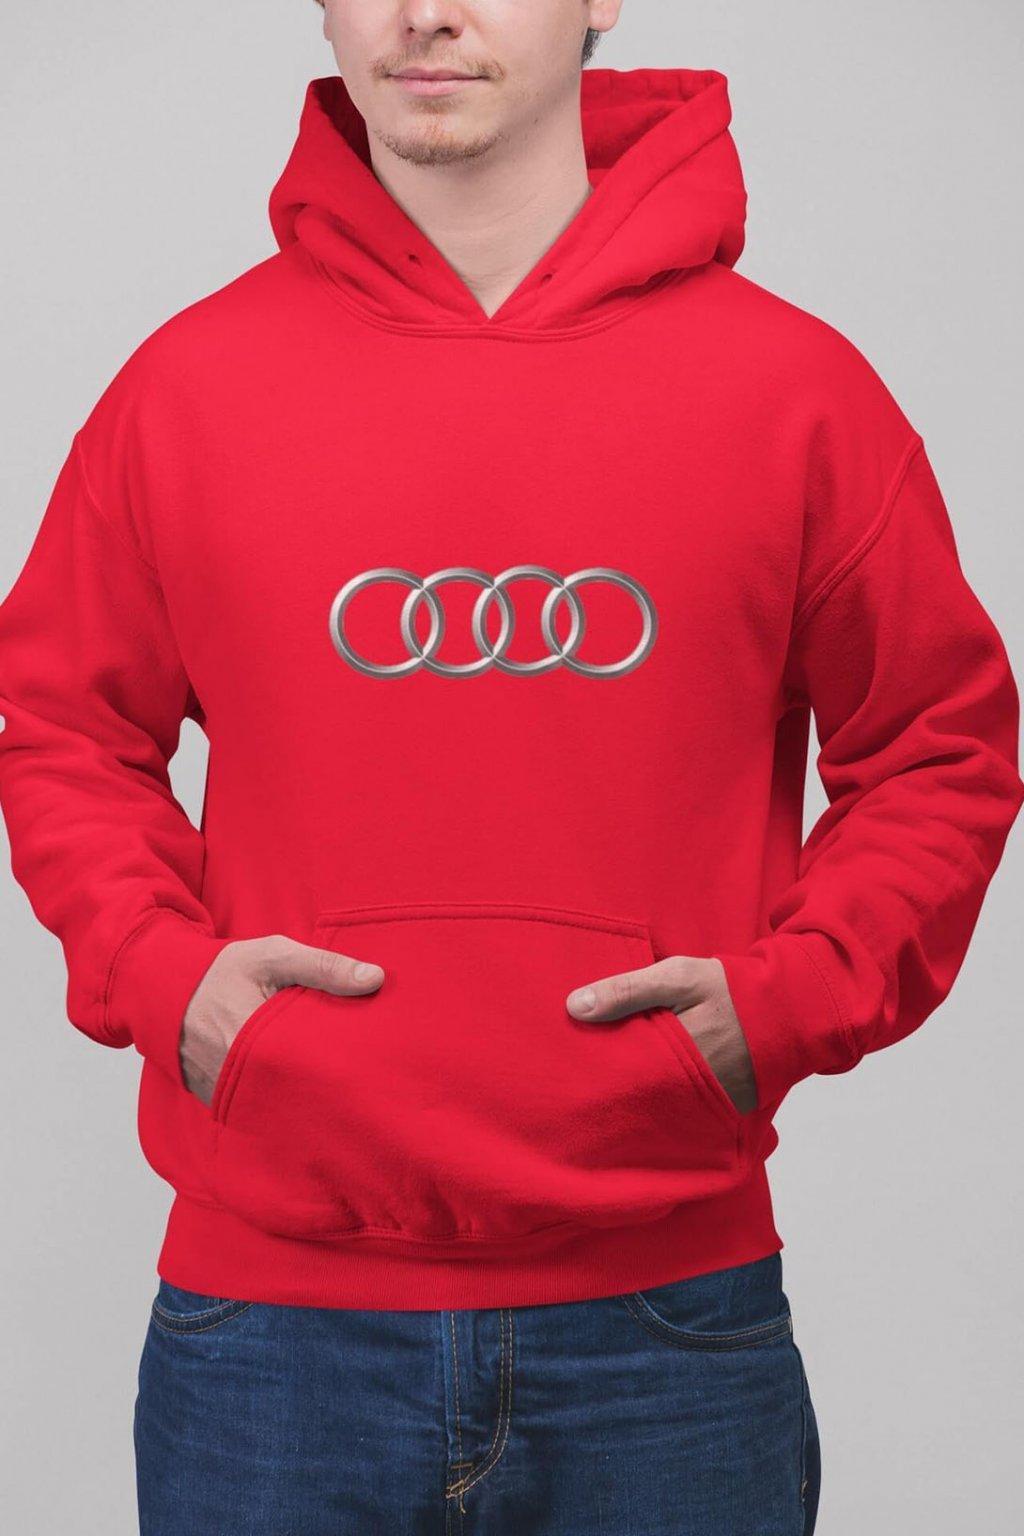 Pánska mikina s logom auta Audi